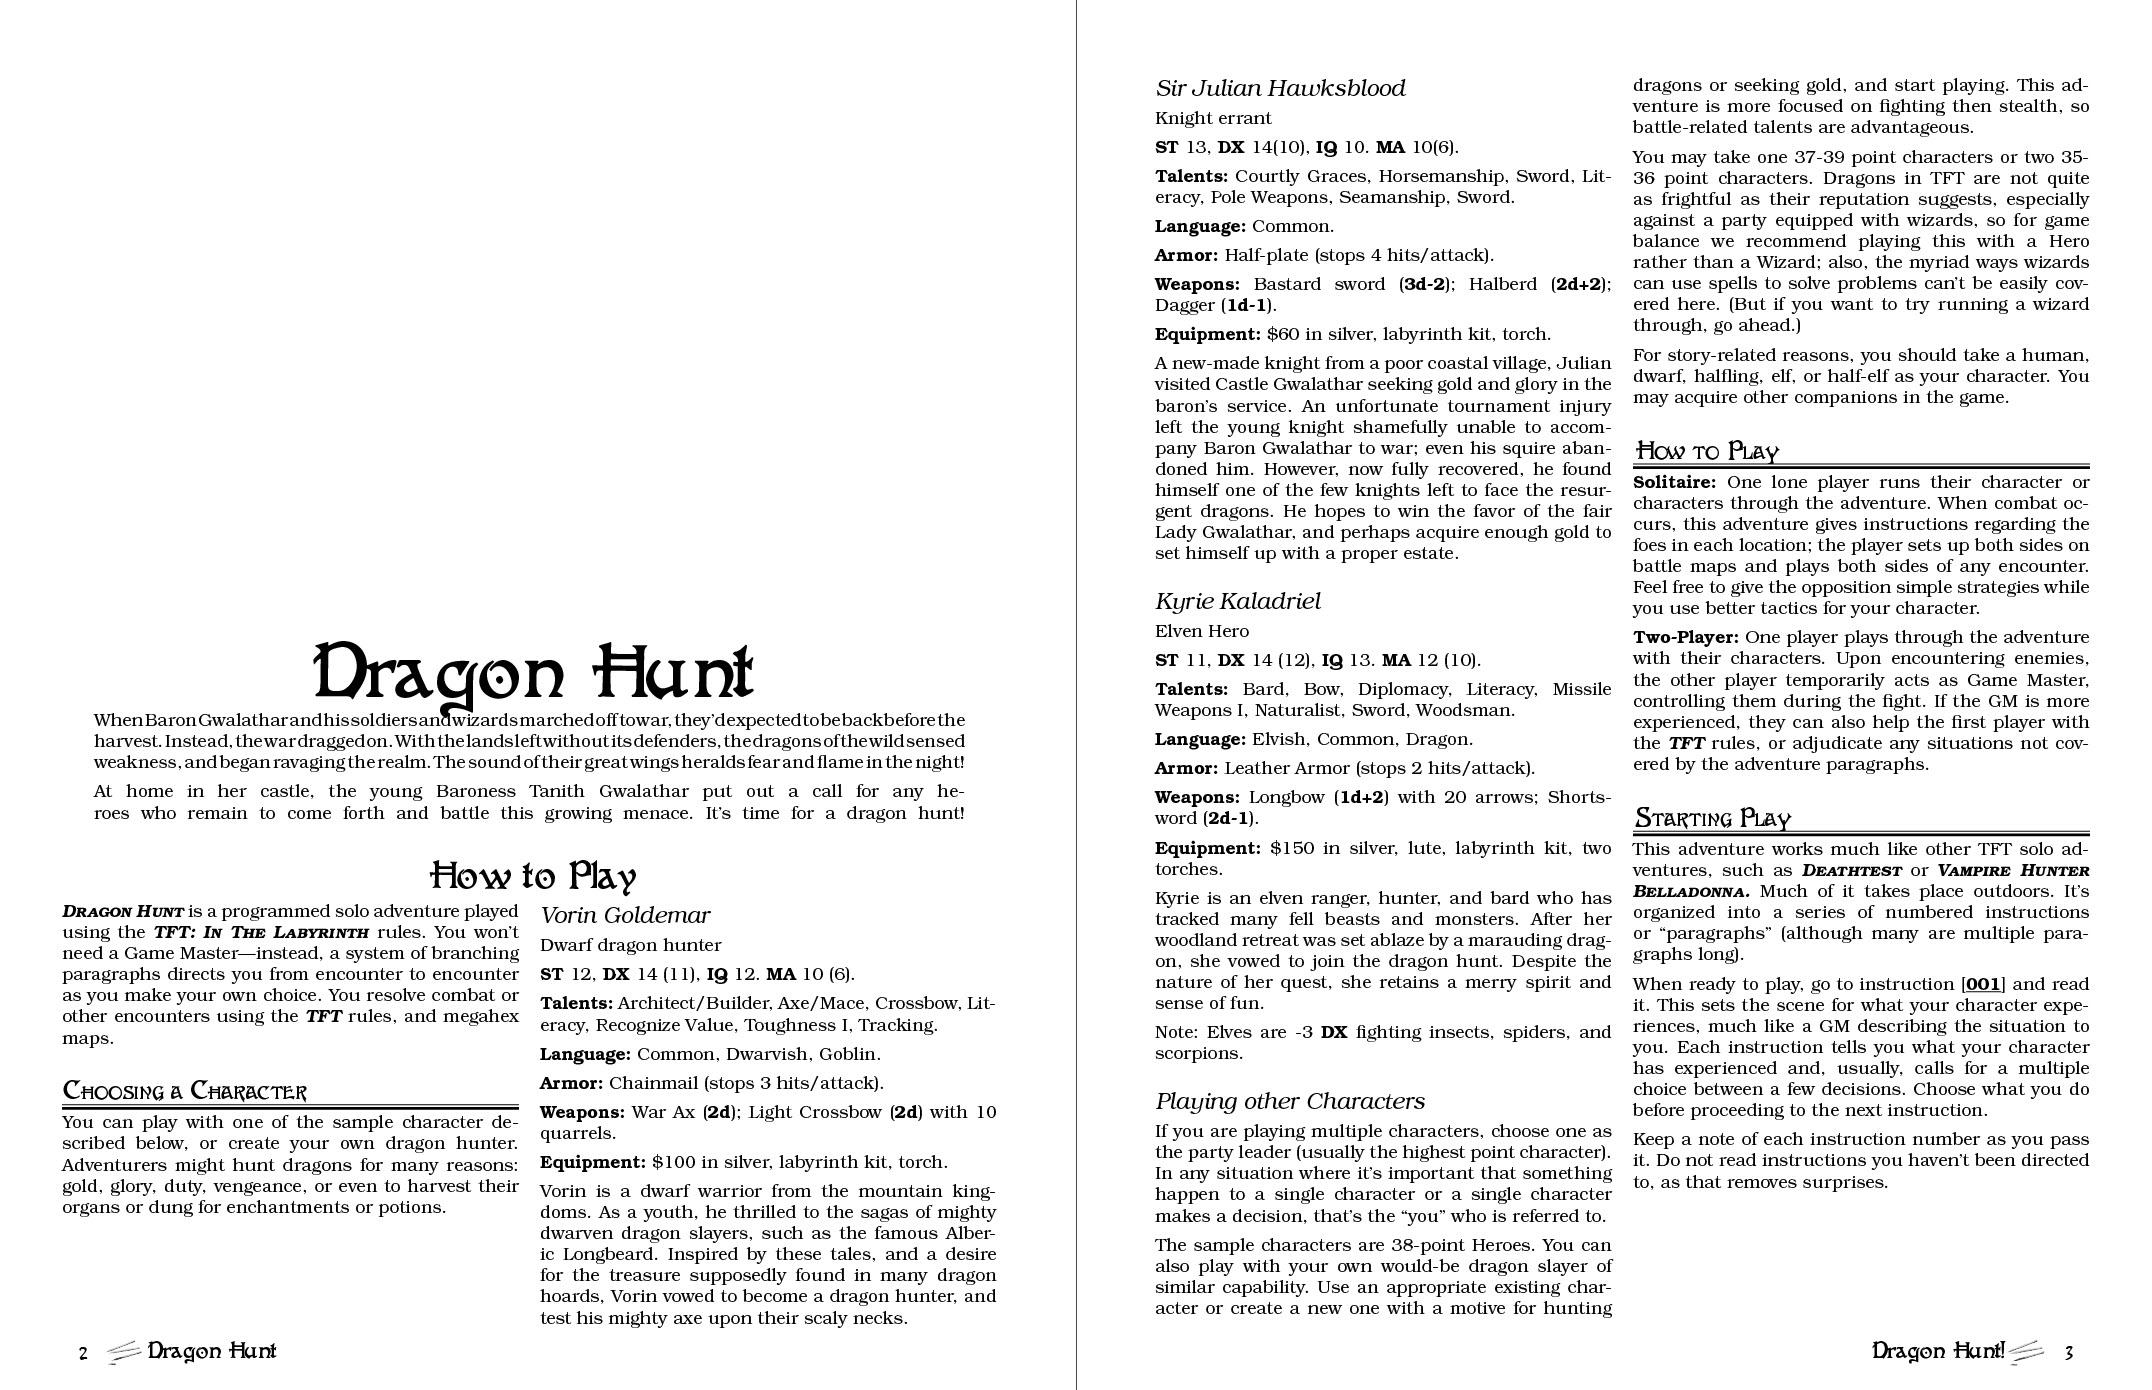 Dragon Hunt Sample Spread.jpg